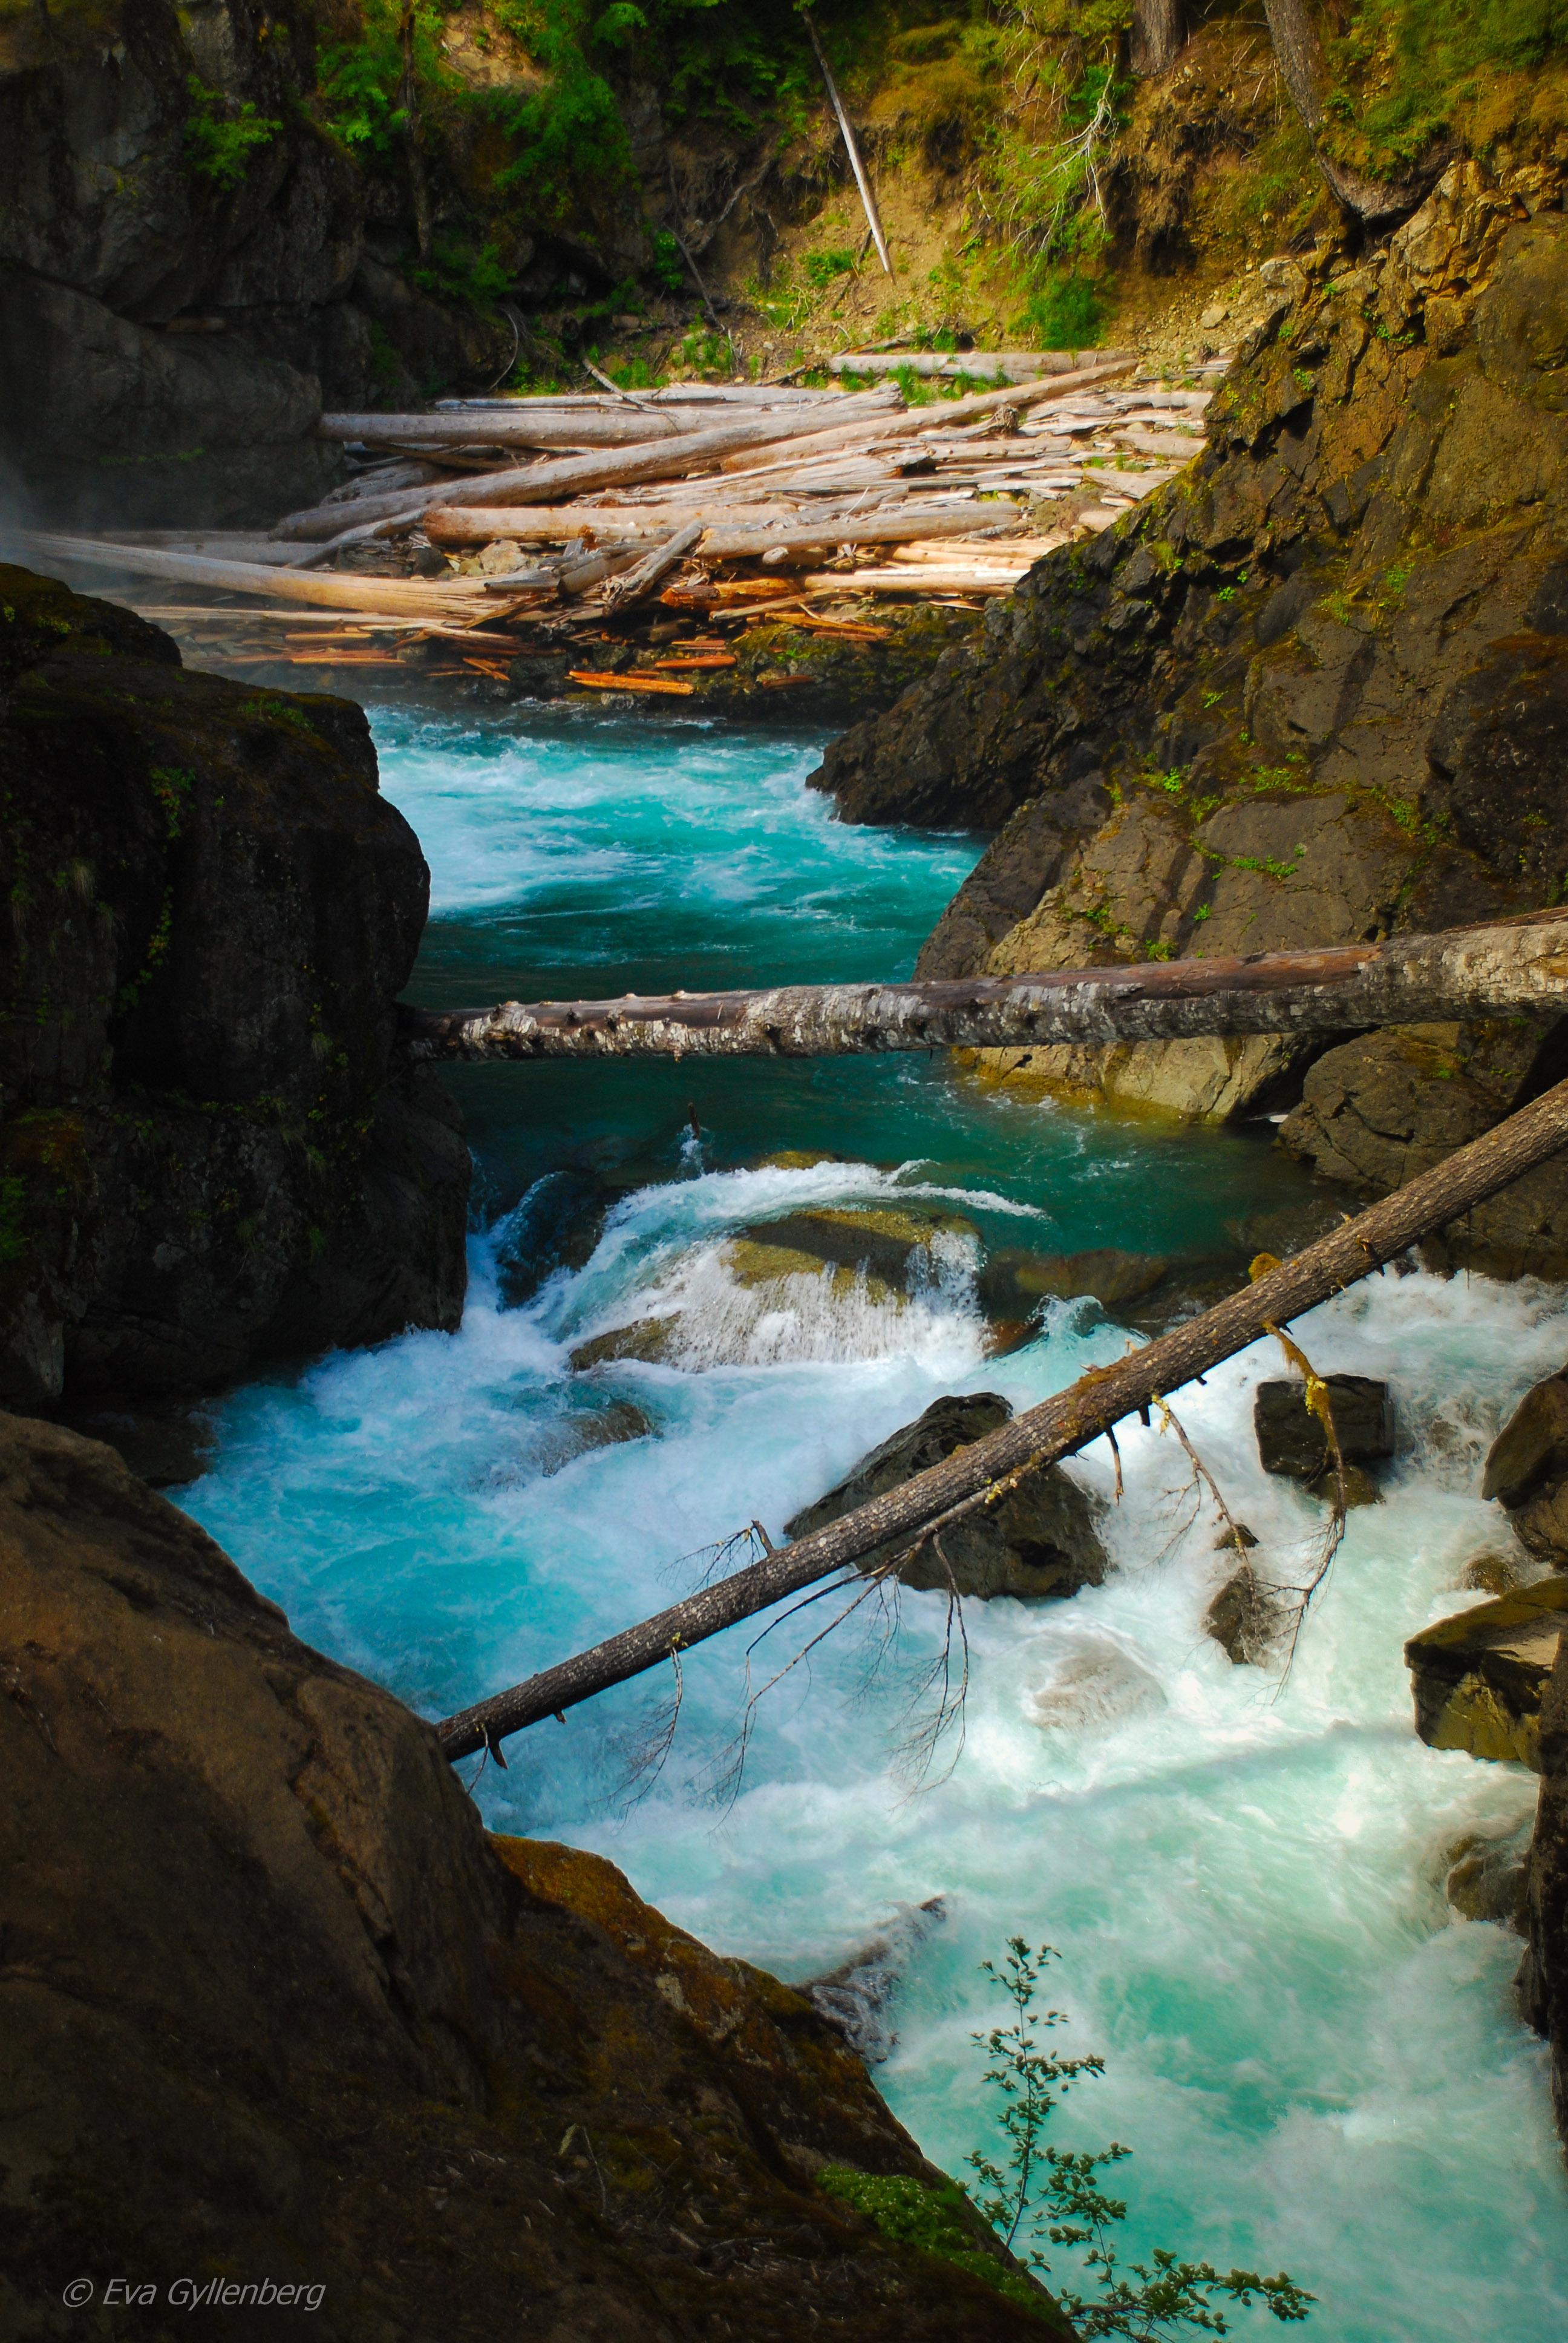 Silver falls - Mount Rainier - Washington